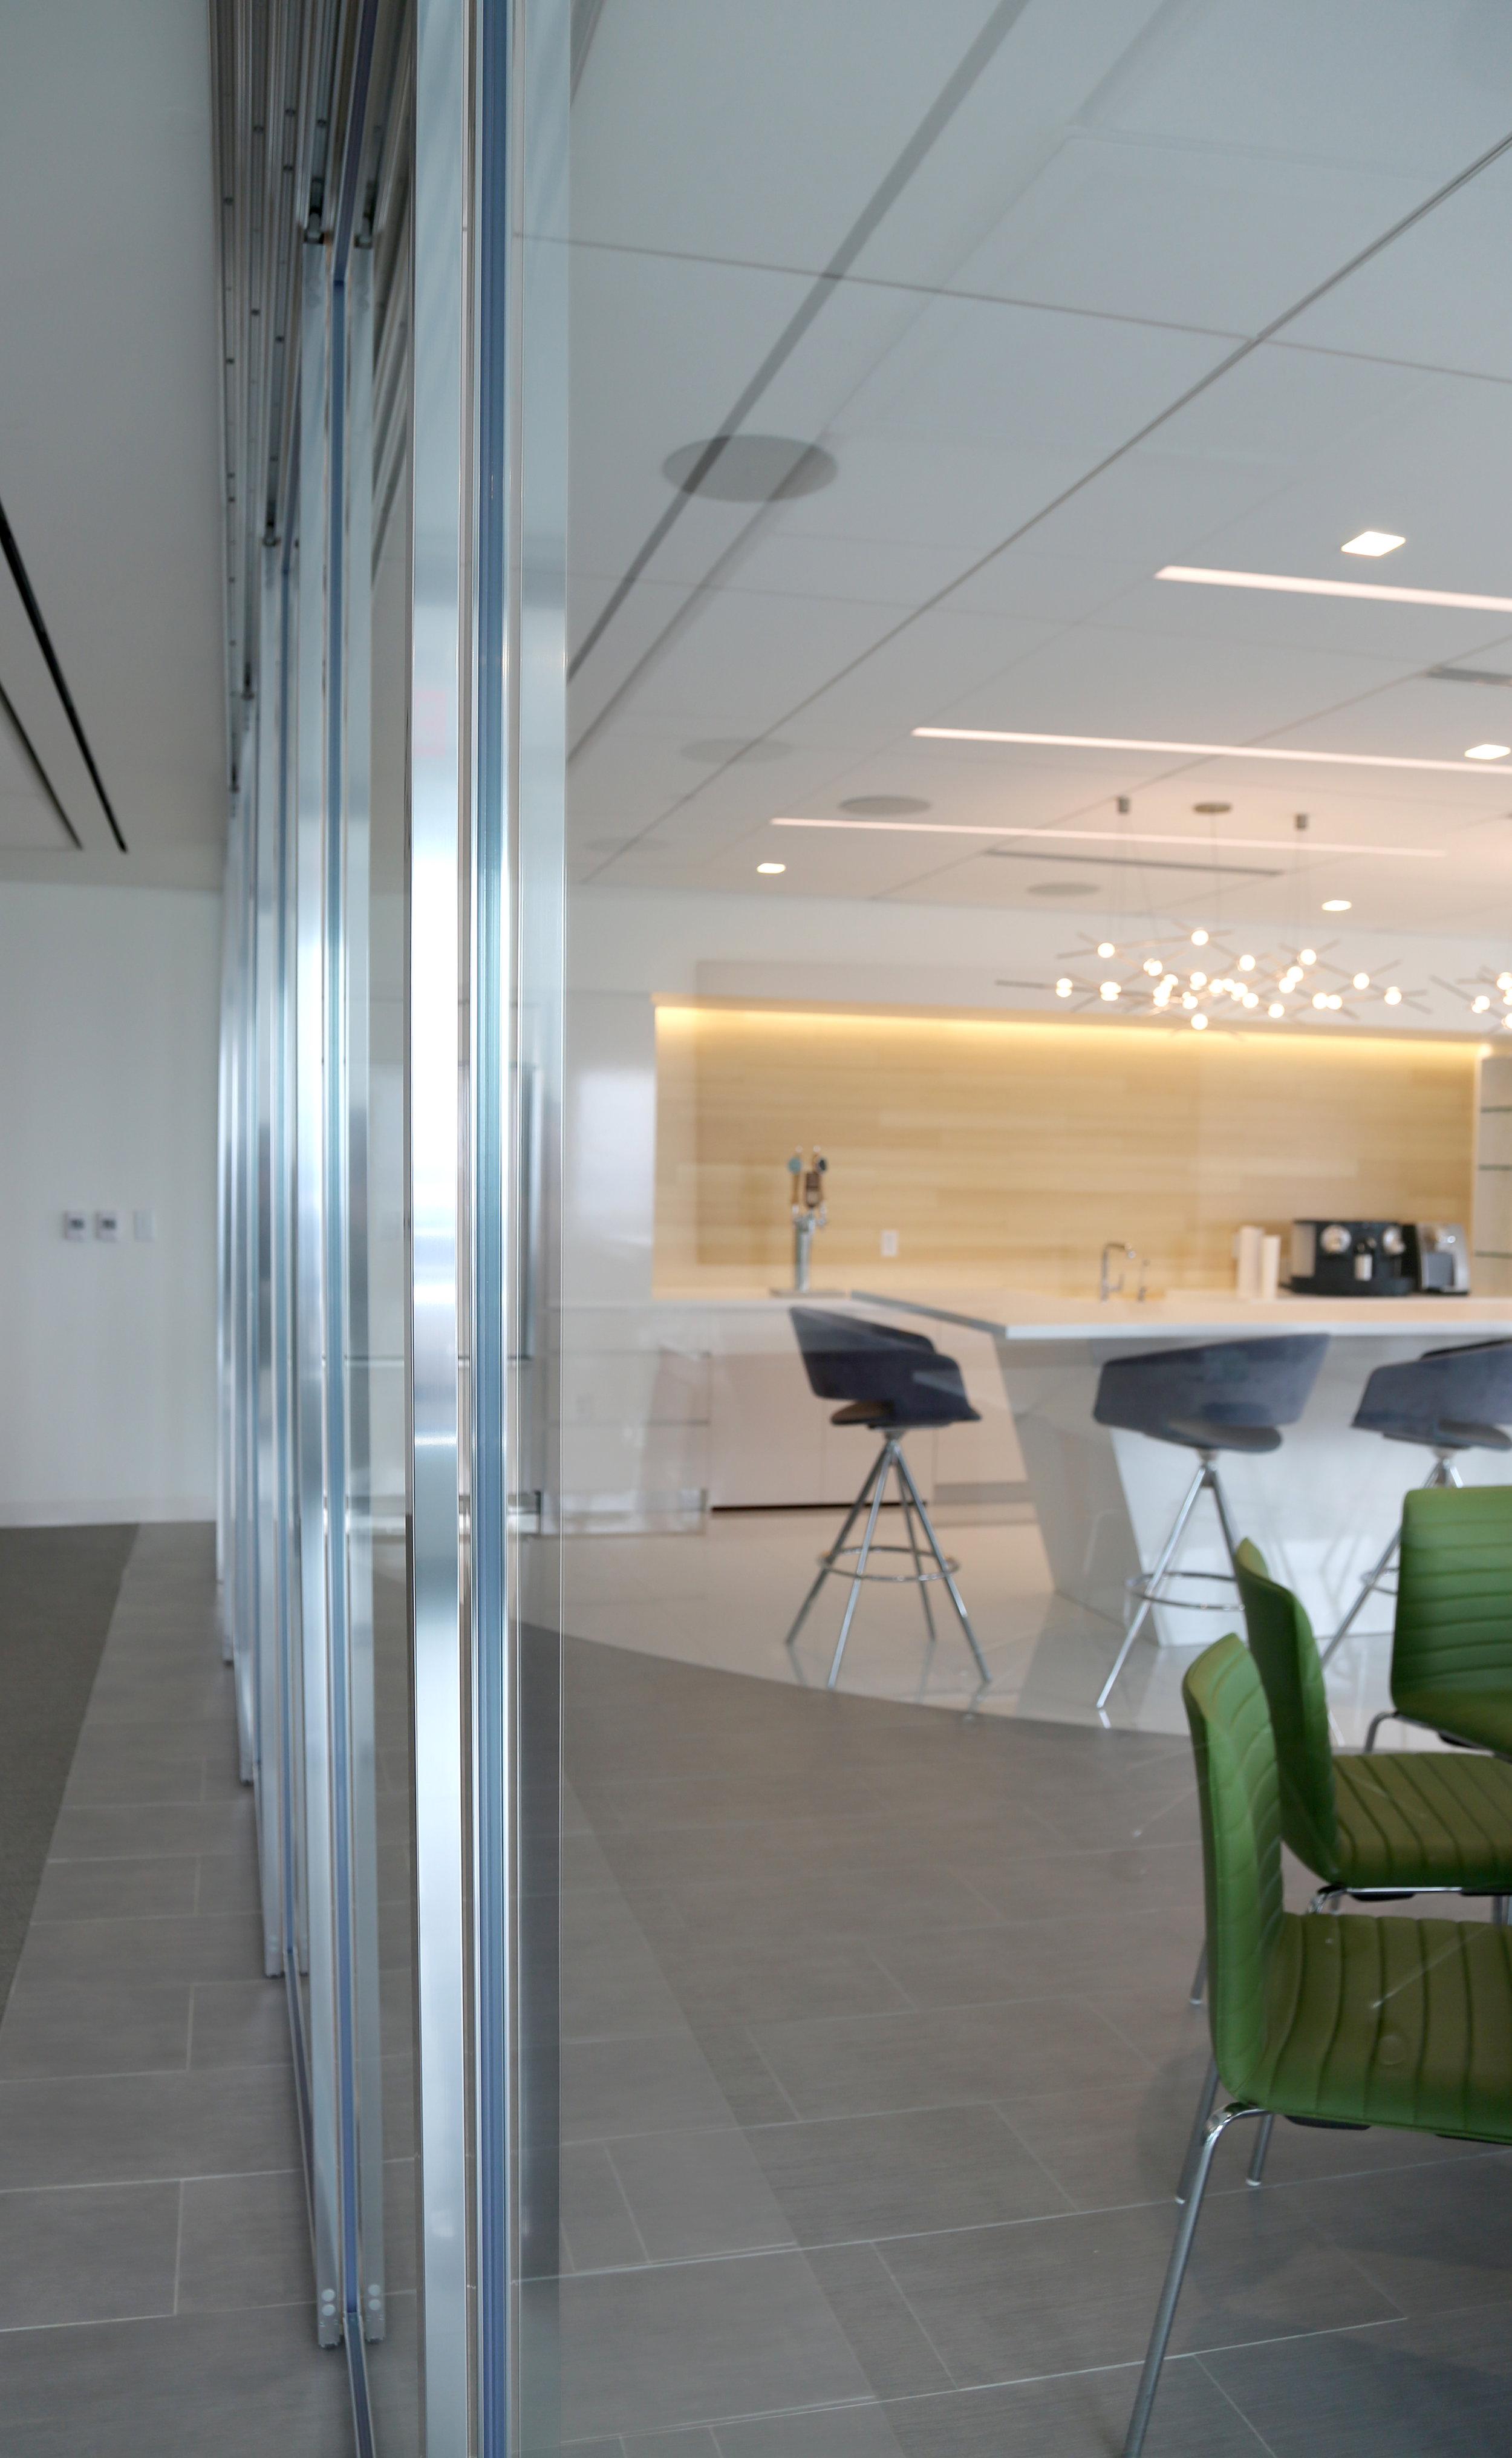 Sliding Glass Wall System Narrow Profile Aluminum Frame - Spaceworks AI.jpg